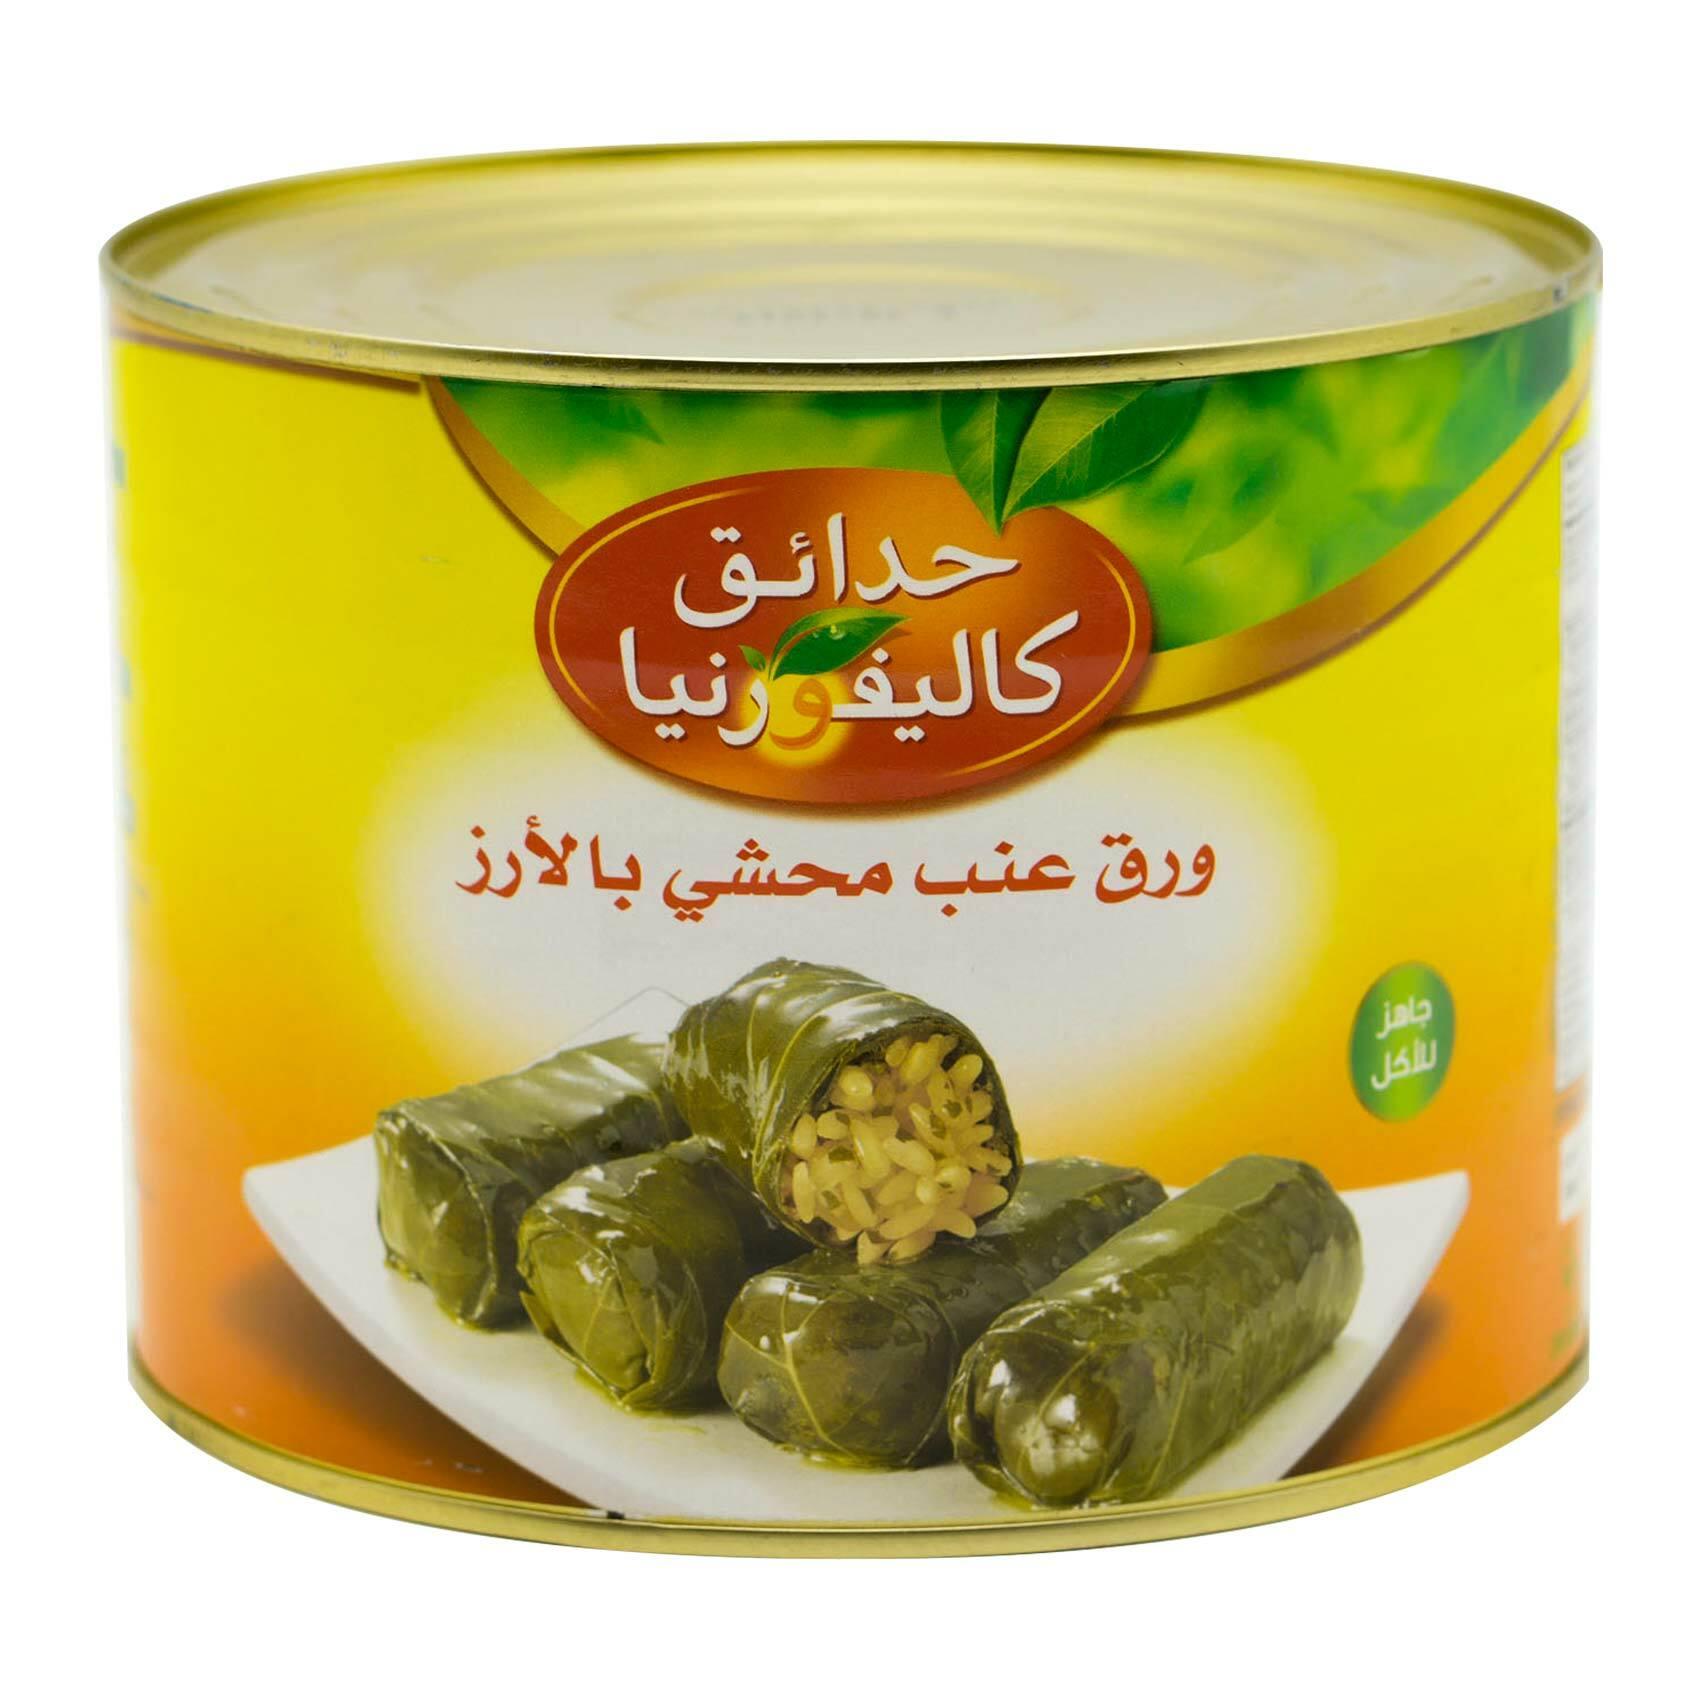 Buy California Garden Stuffed Vine Leaves With Rice 2 Kg Online Shop Food Cupboard On Carrefour Saudi Arabia